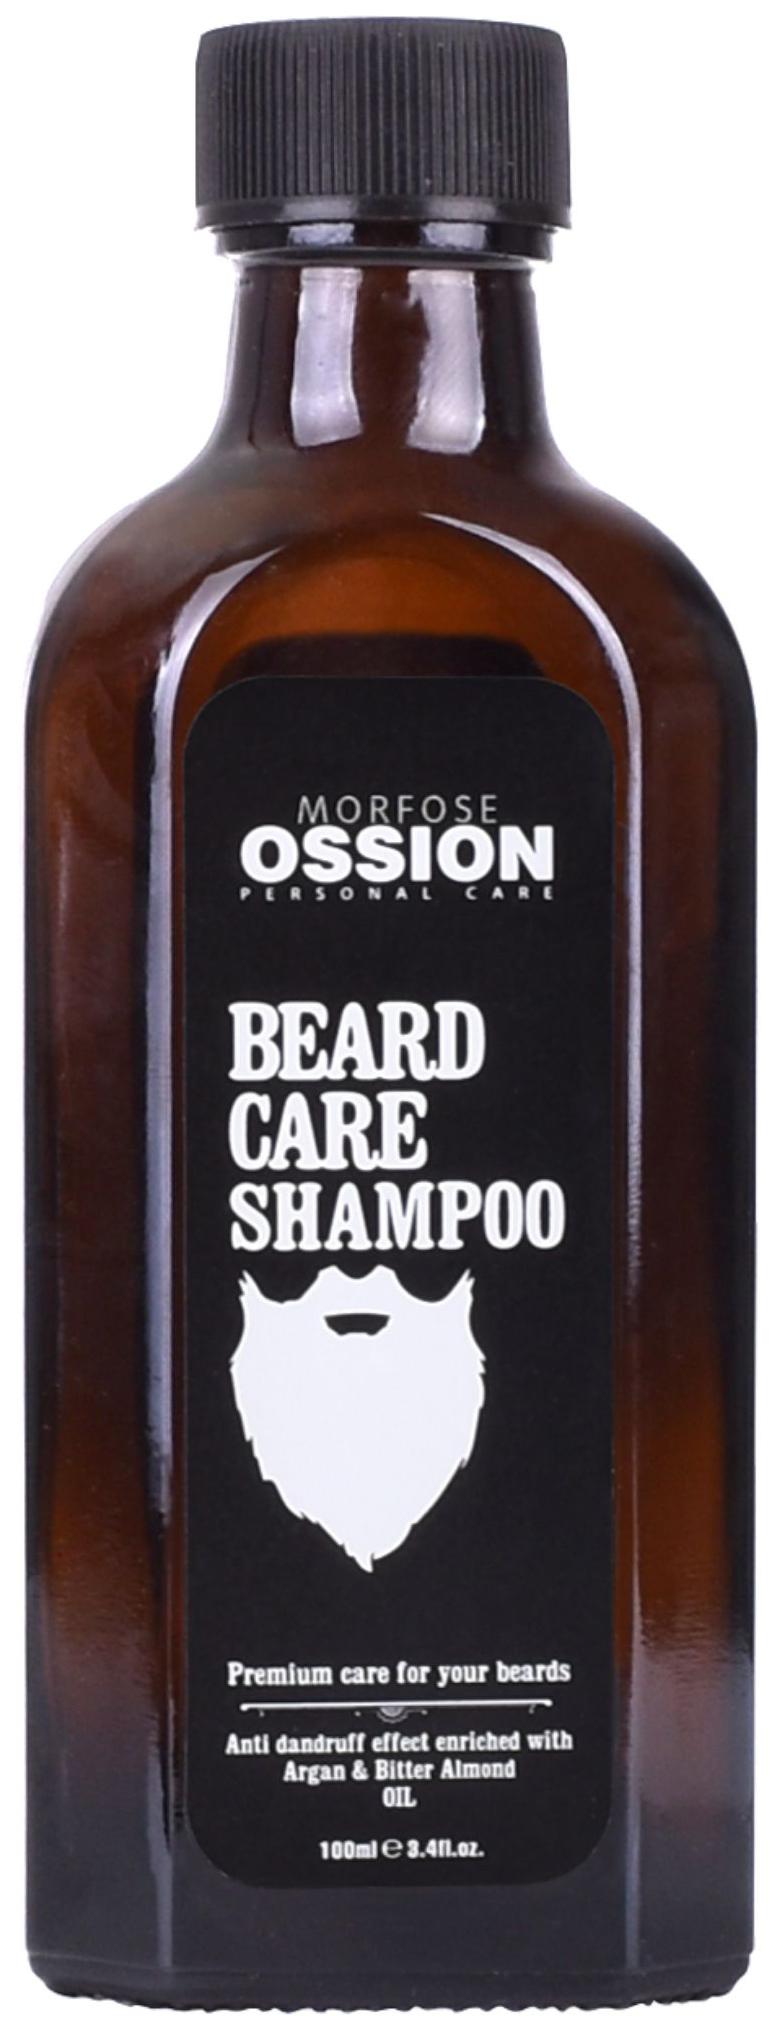 Шампунь для бороды MORFOSE OSSION Beard Care